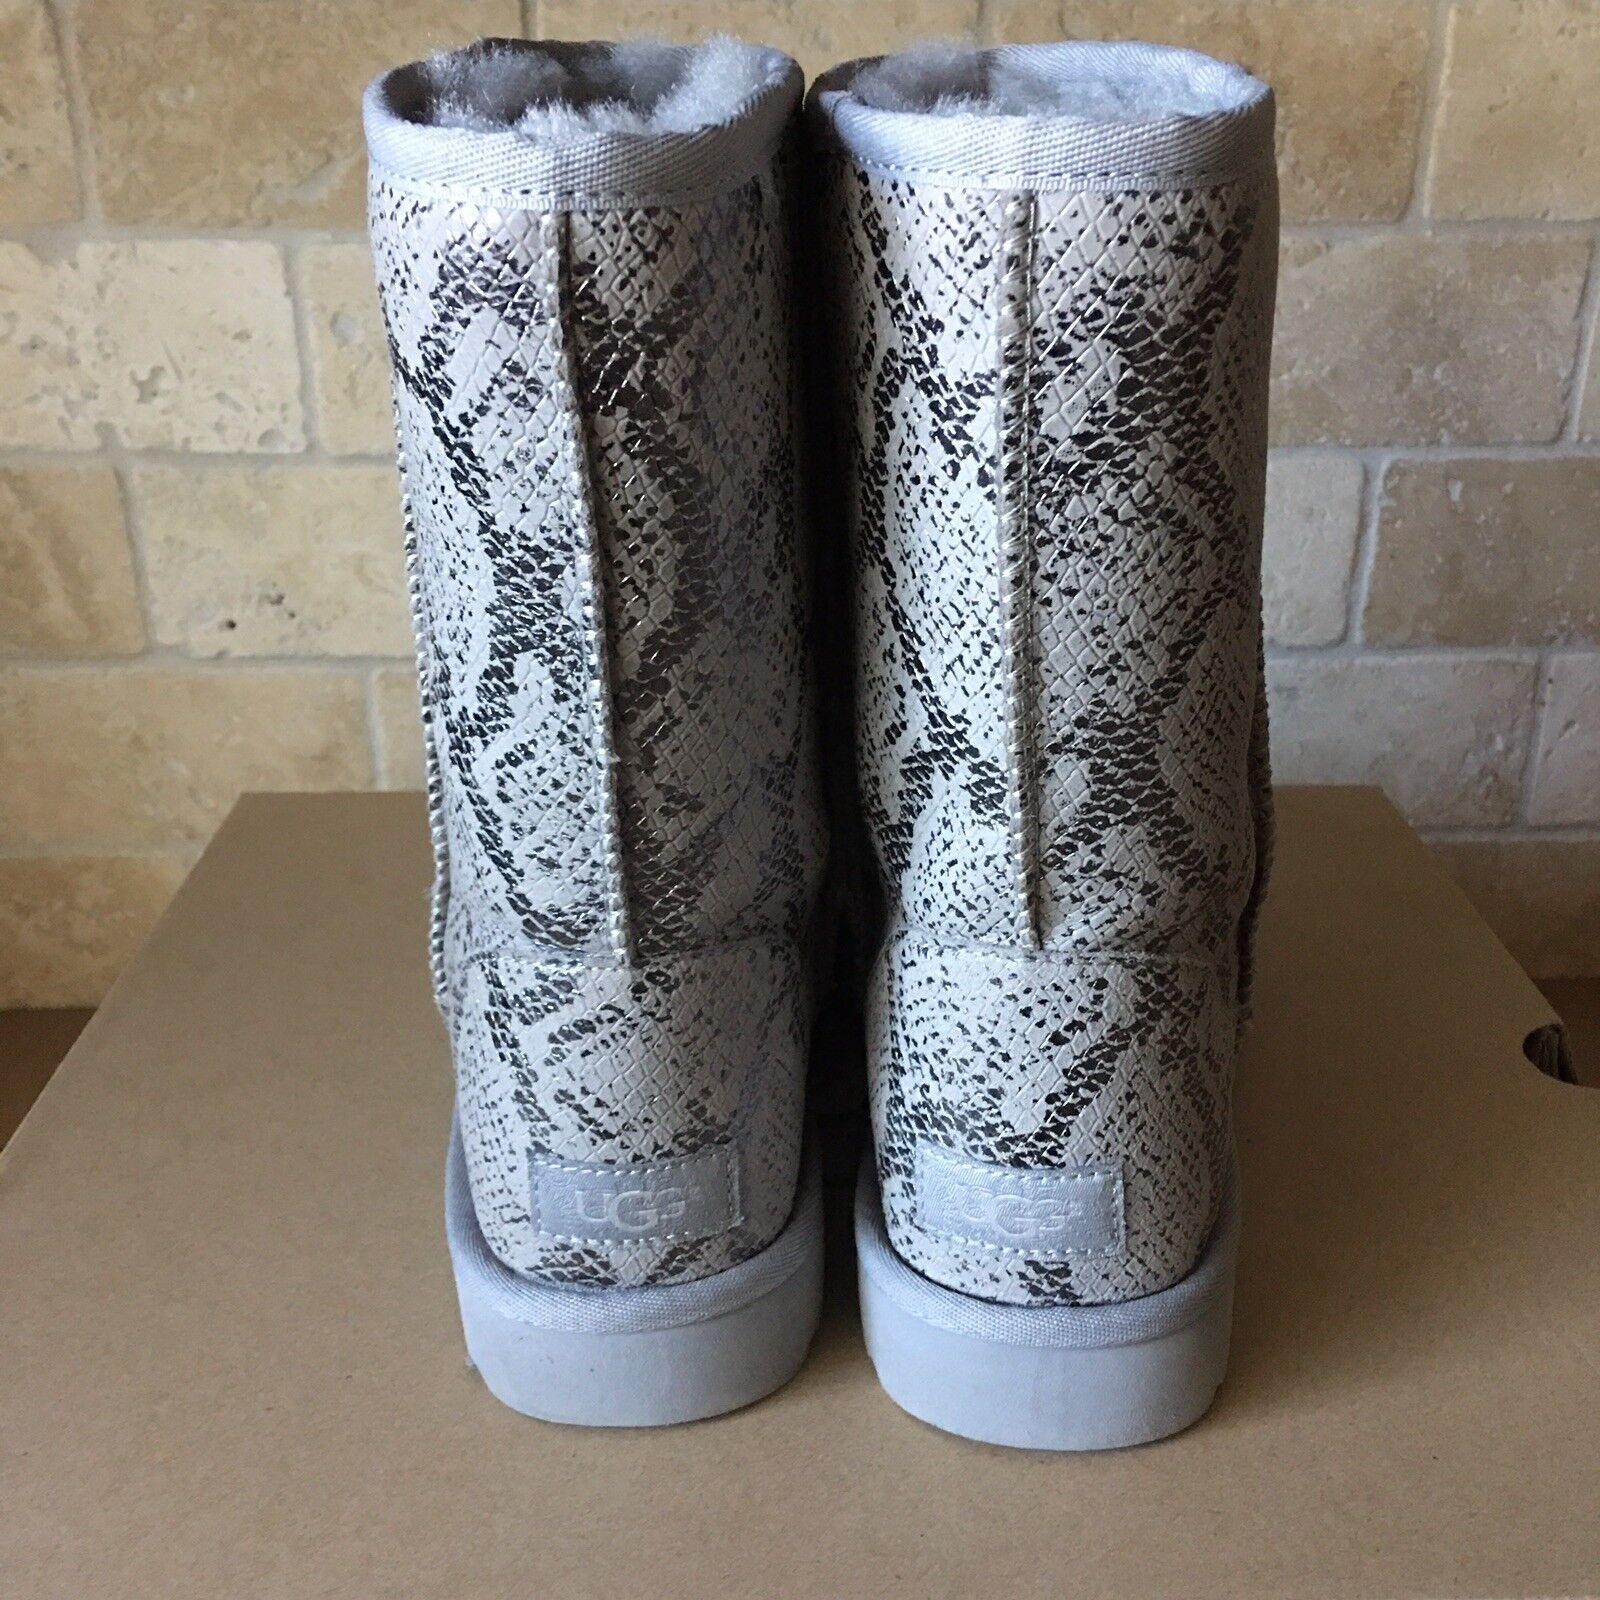 08270f4eada UGG Classic Short Metallic Snake Silver Grey Suede Fur Boots Size US 10  Womens